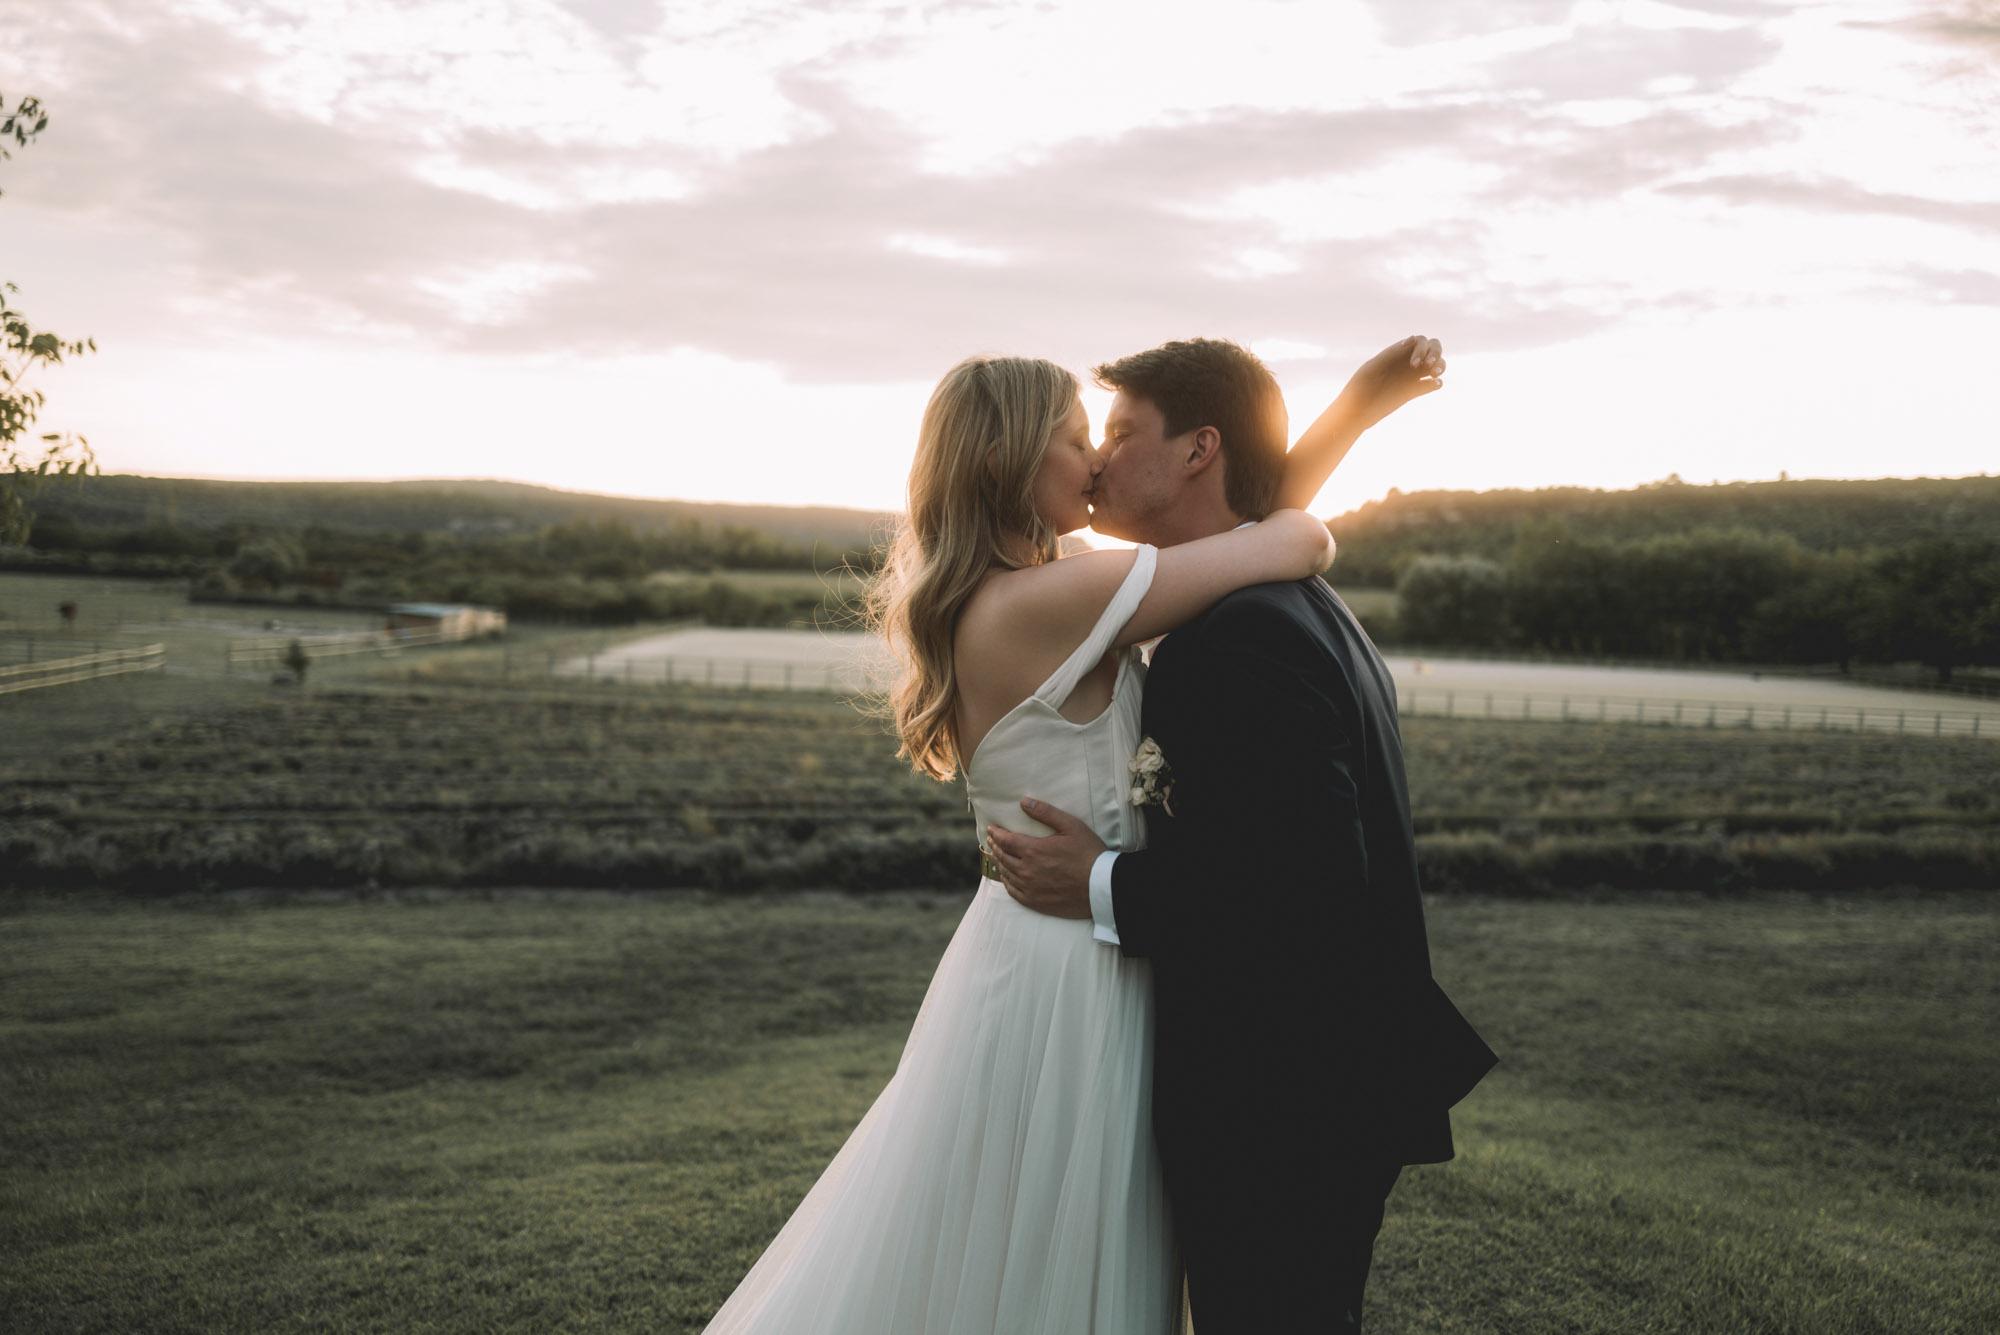 KATHARINA + DIMITRI_DOMAINES DE PATRAS_PHOTOGRAPHE MARIAGE_LES BANDITS-8